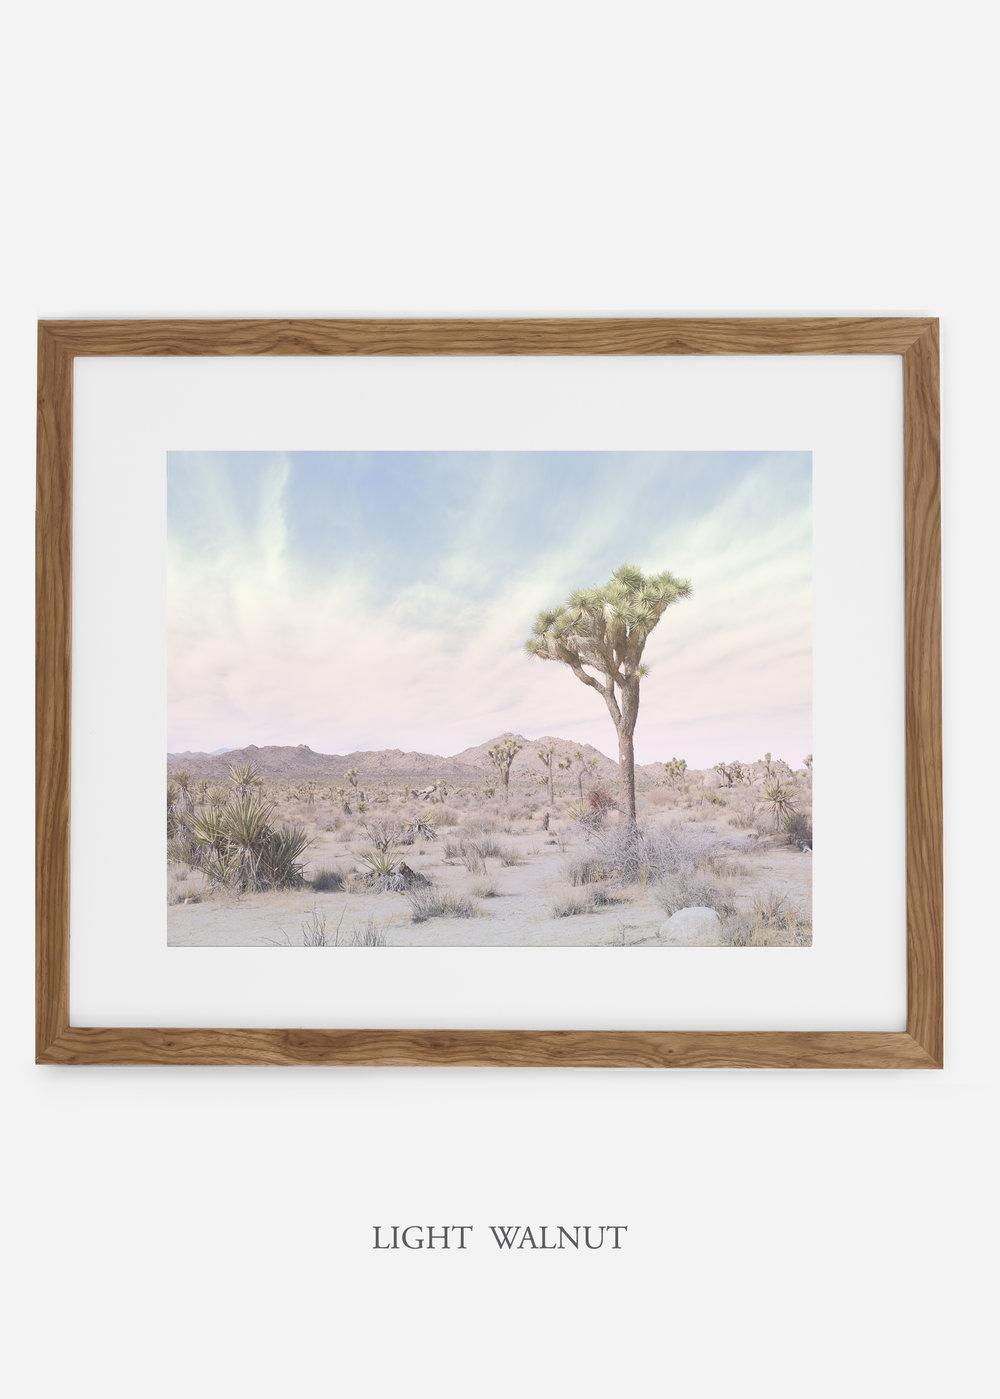 WilderCalifornia_lightwalnut_JoshuaTree_No.13_interiordesign_prints_art.jpg